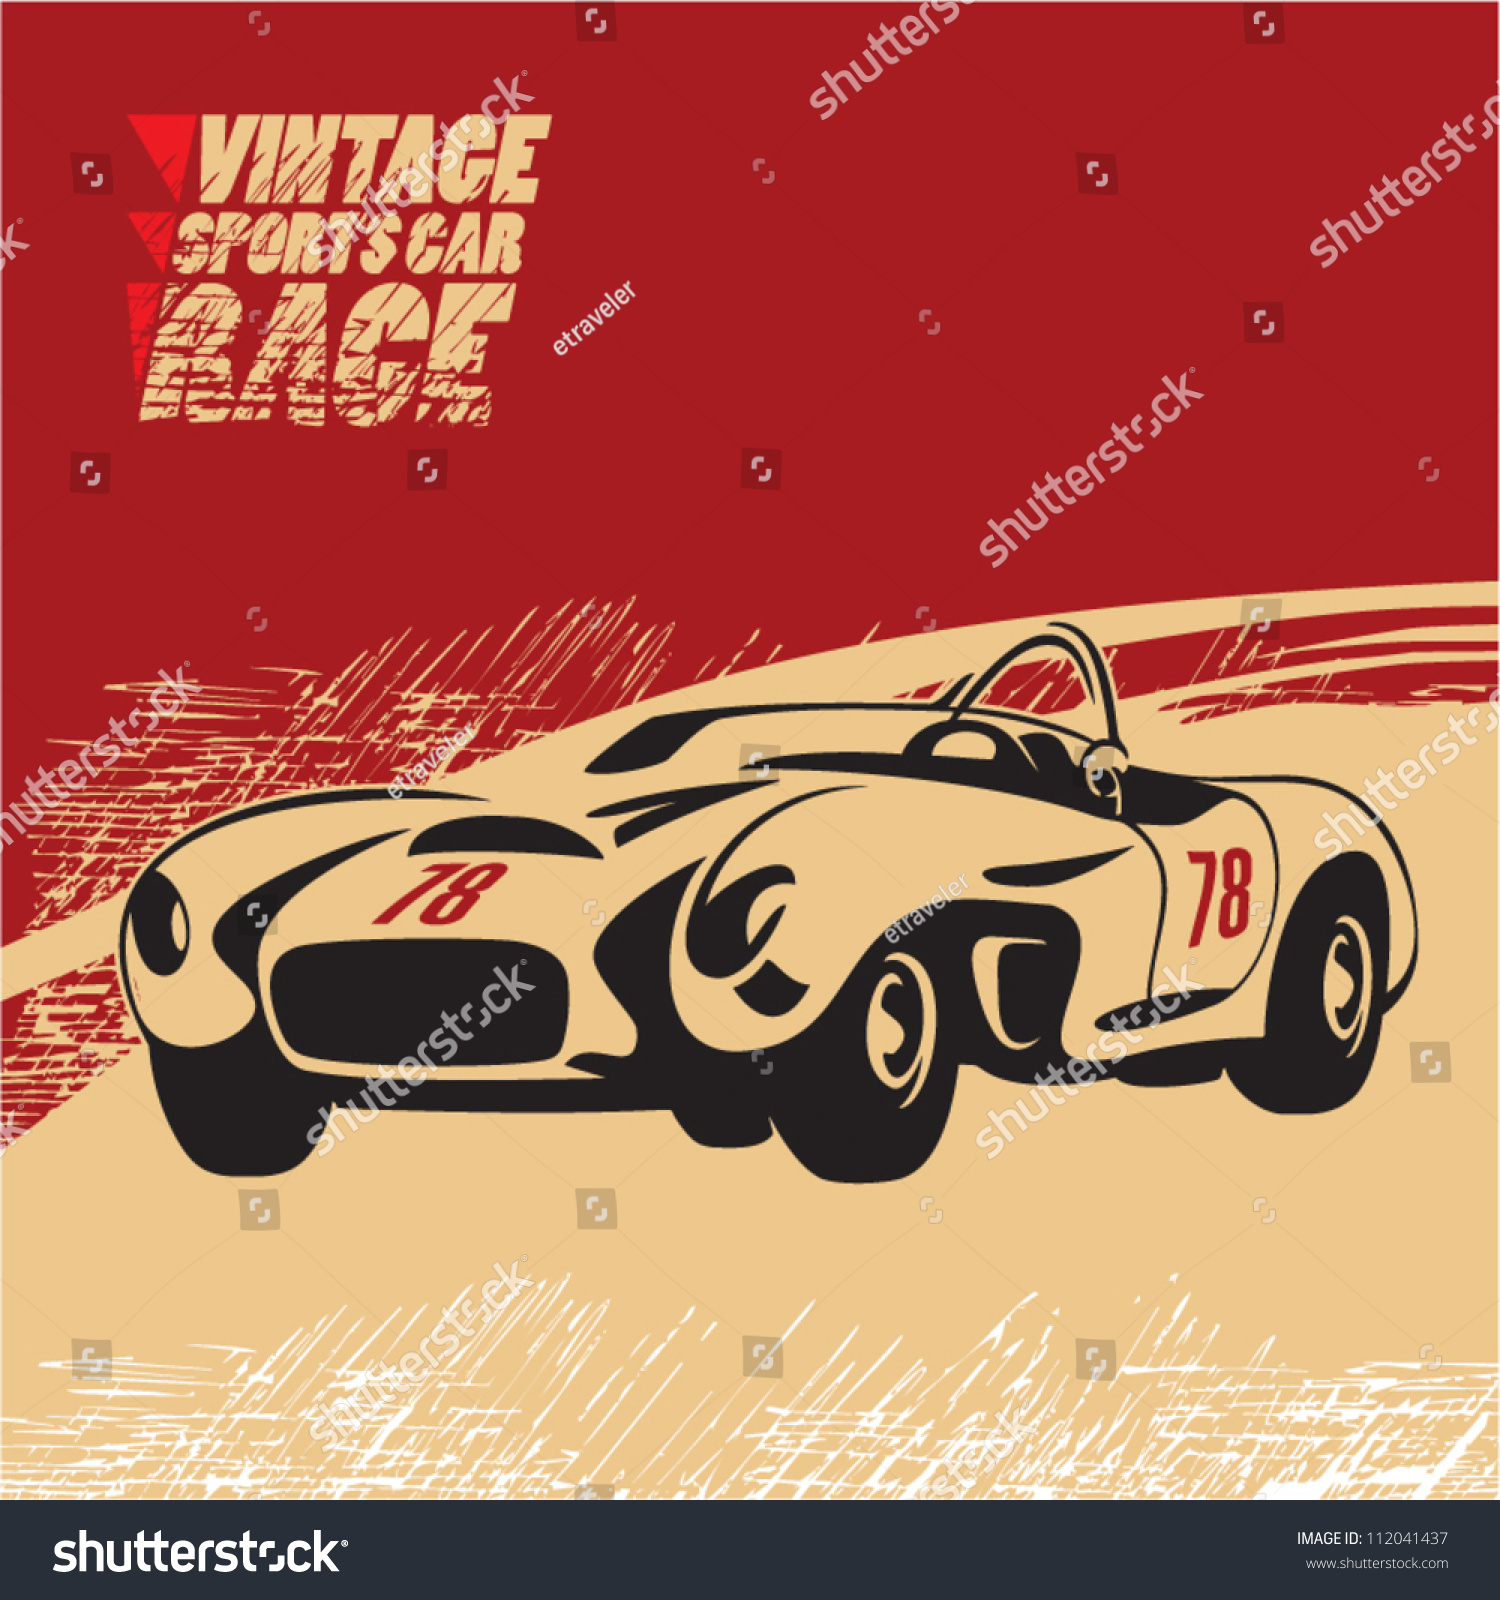 Vintage Sports Car Race Stock Vector 112041437 - Shutterstock